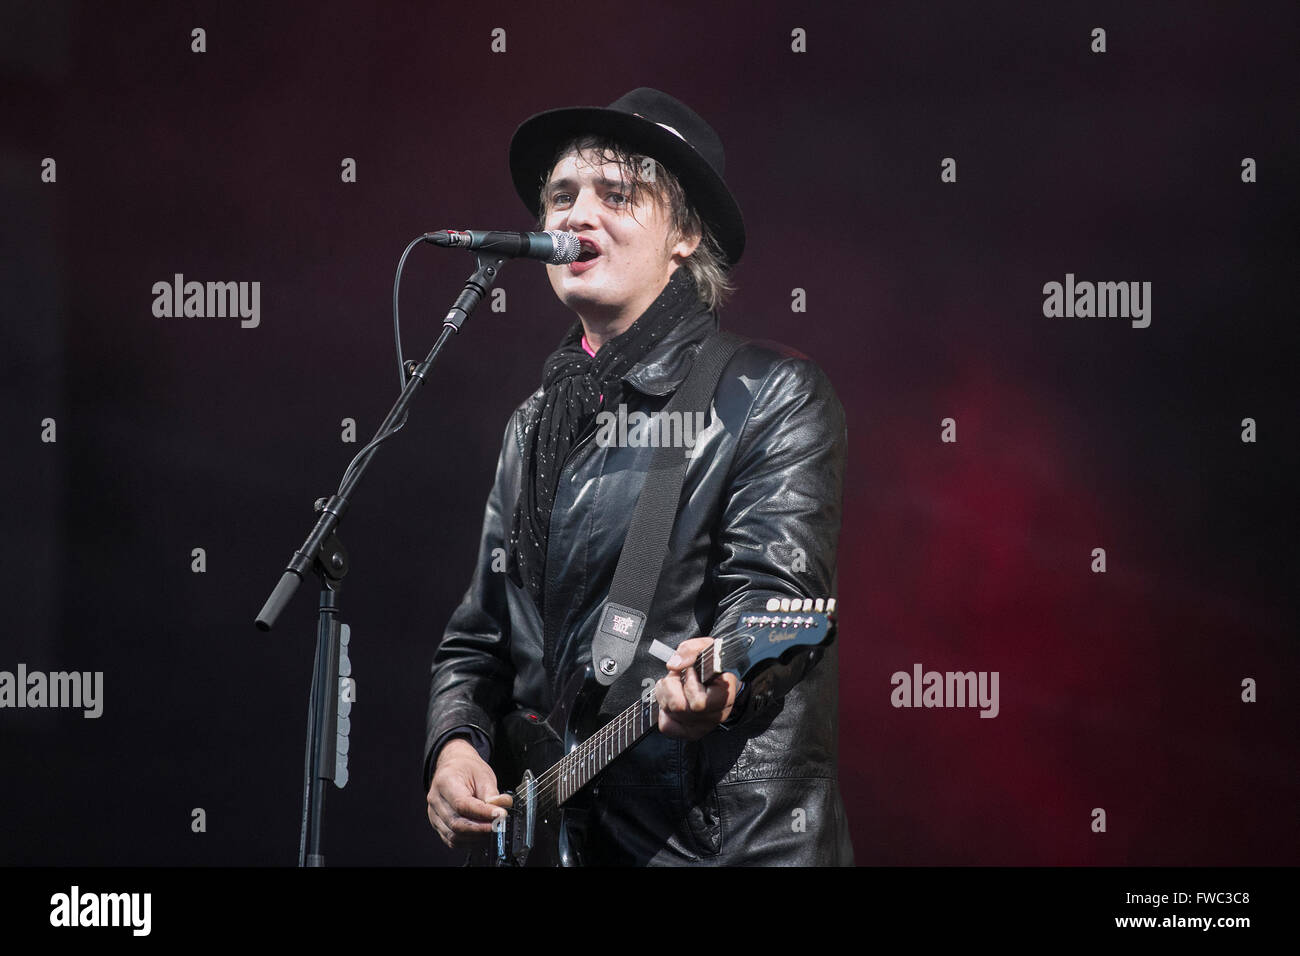 Pete doherty leather jacket